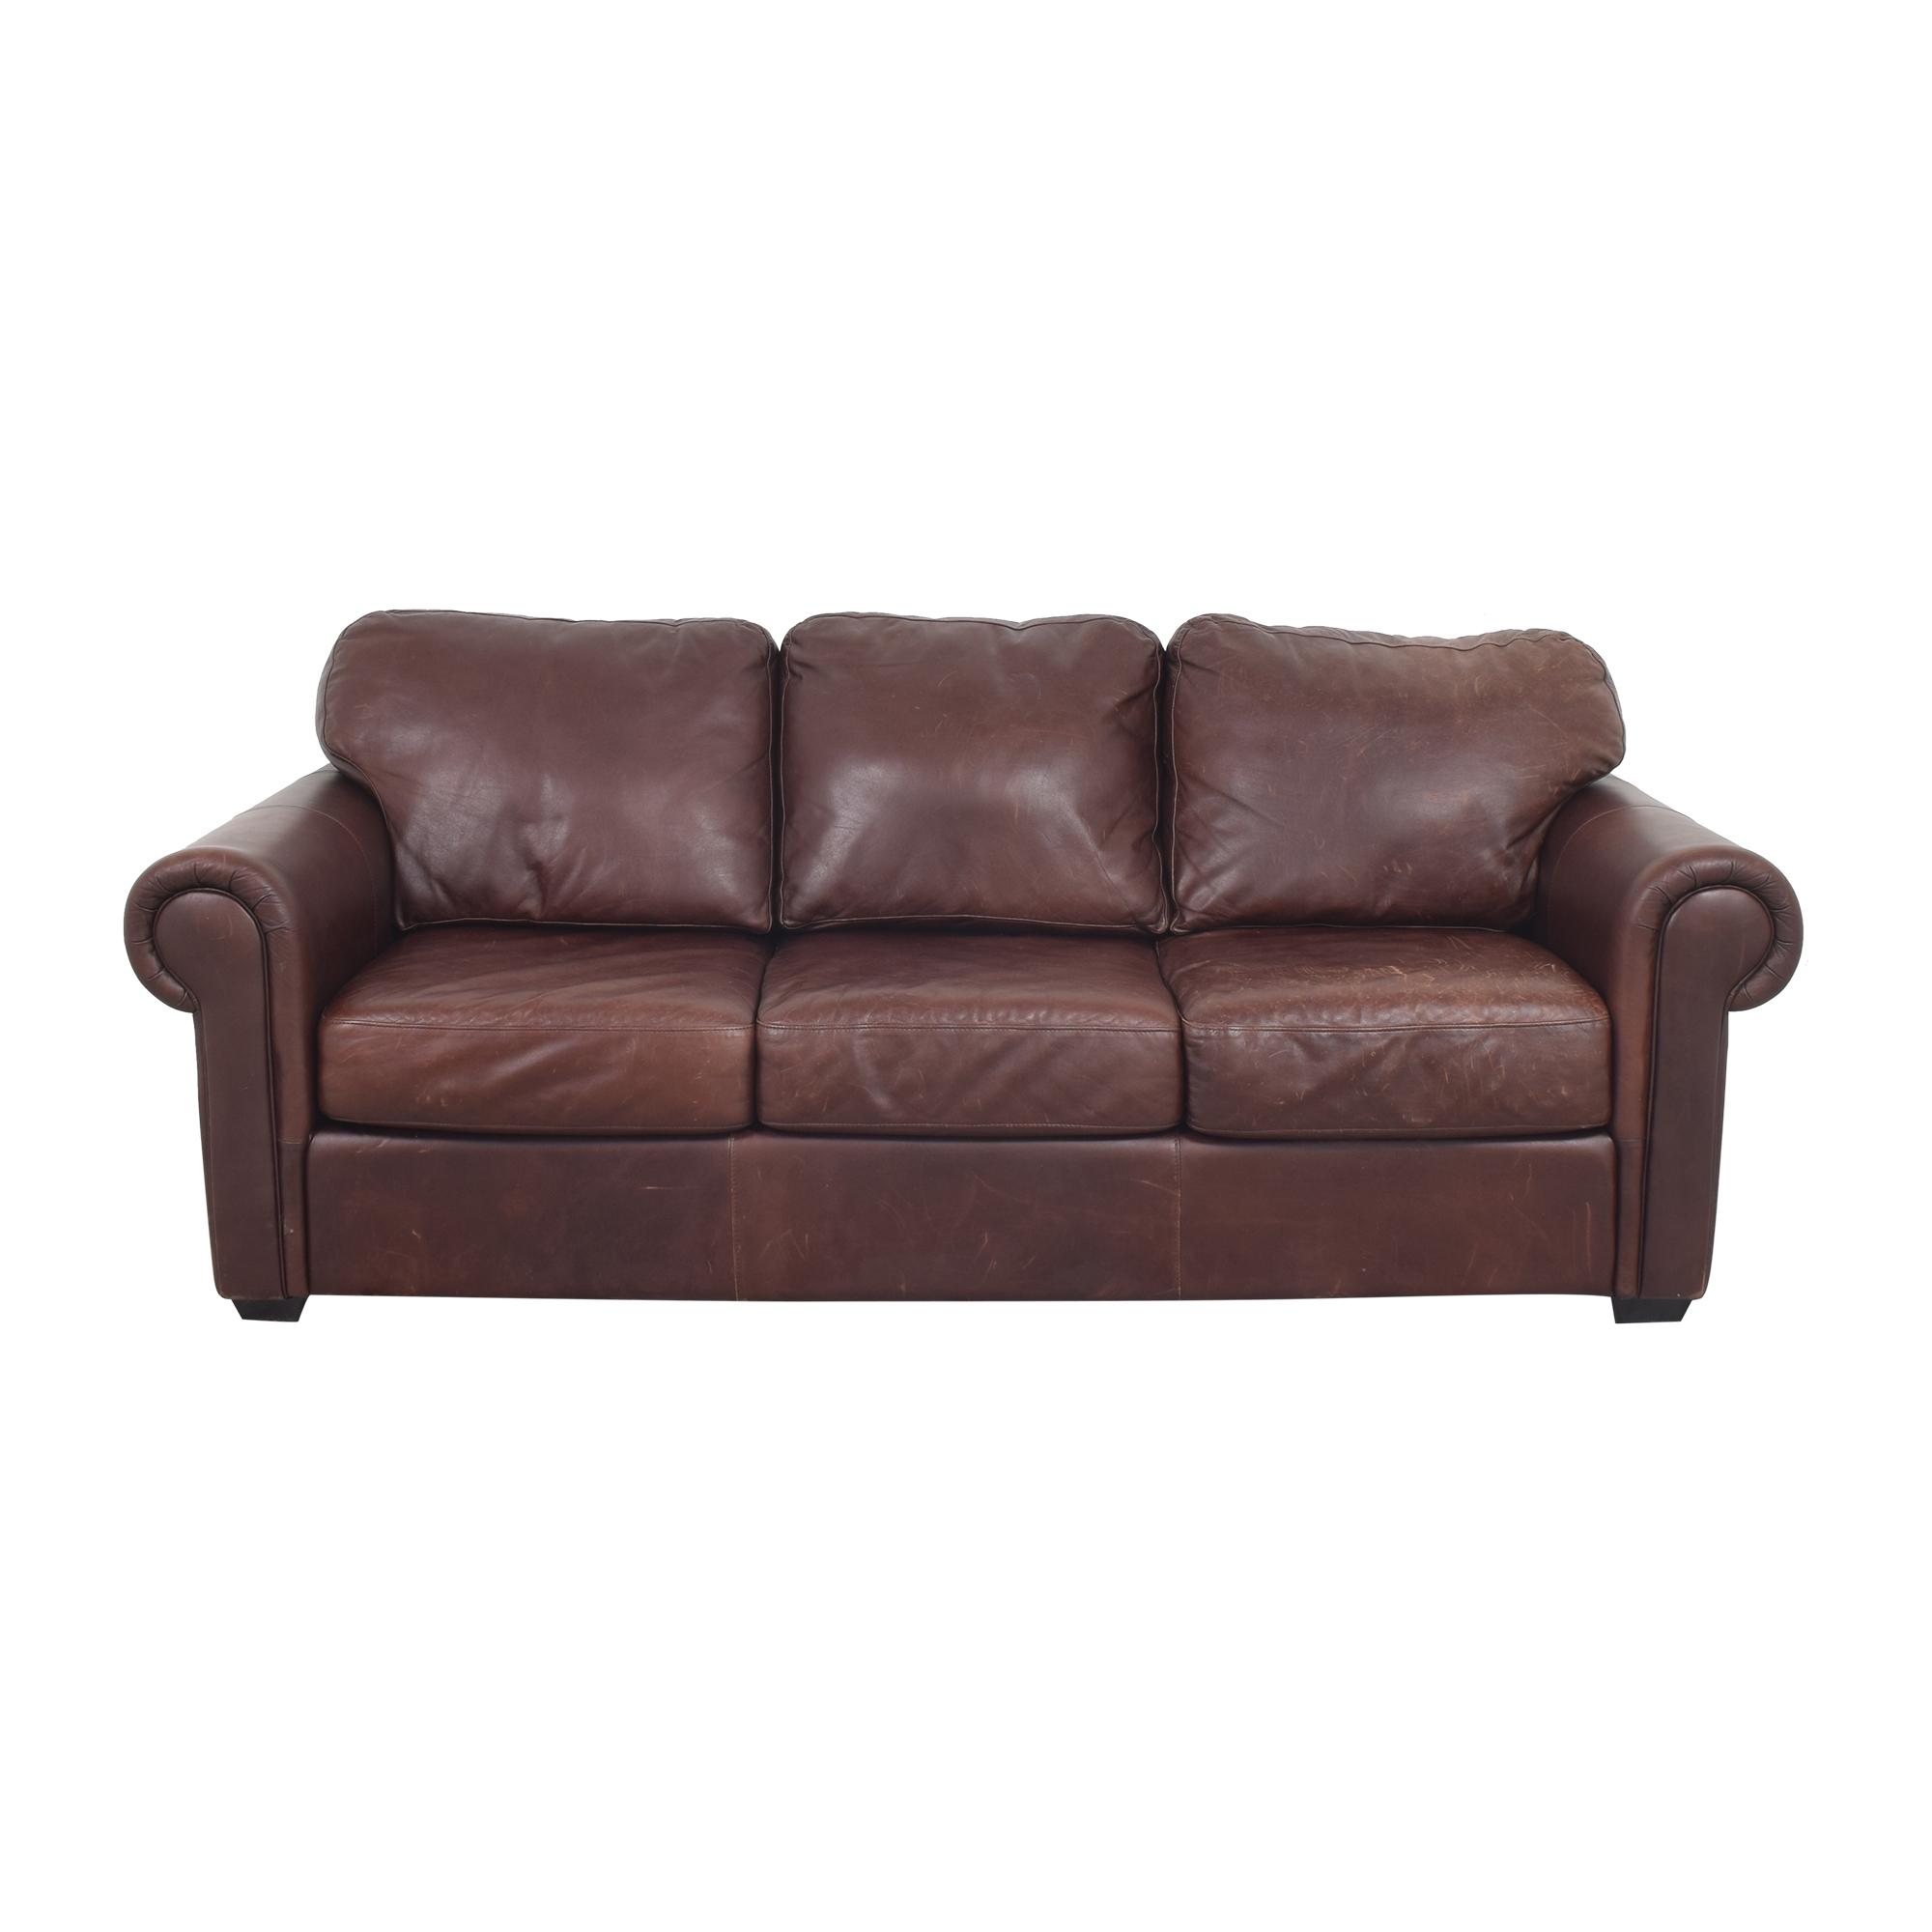 Campio Furniture Campio Furniture Bloor Roll Arm Sofa on sale